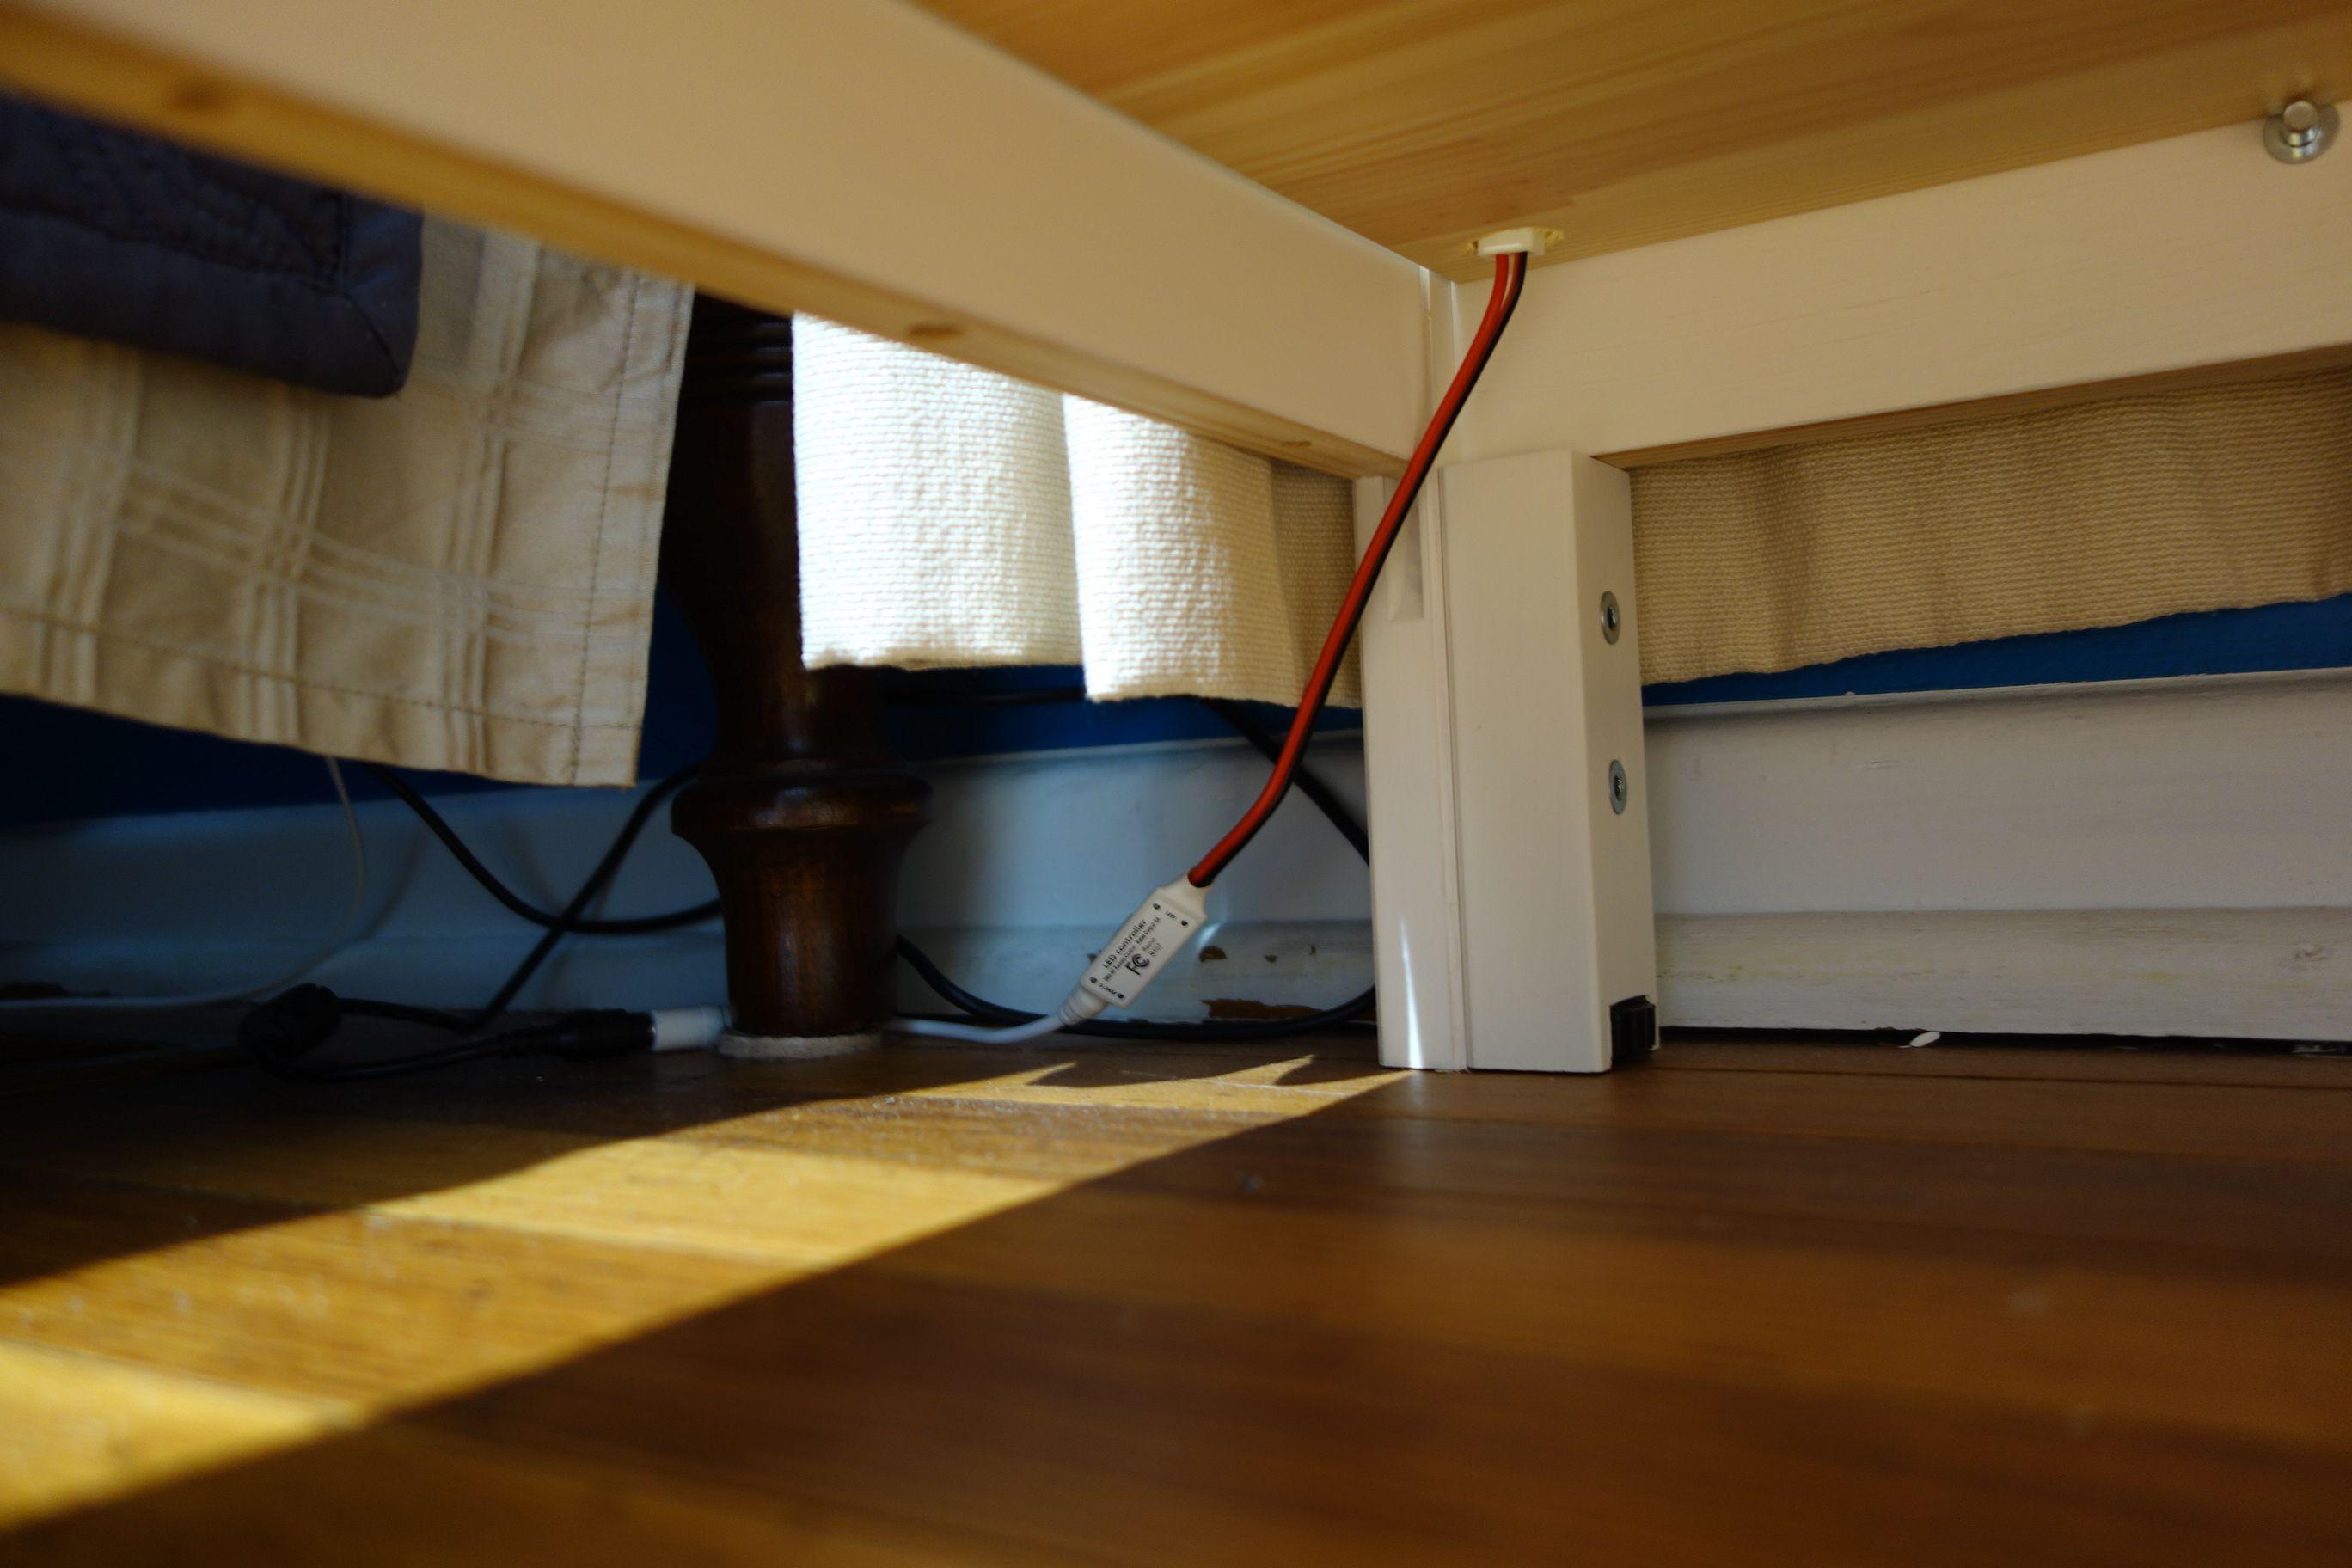 How I set up LED strip lighting in a Billy/Oxberg cabinet - http://ift.tt/2l7umlS